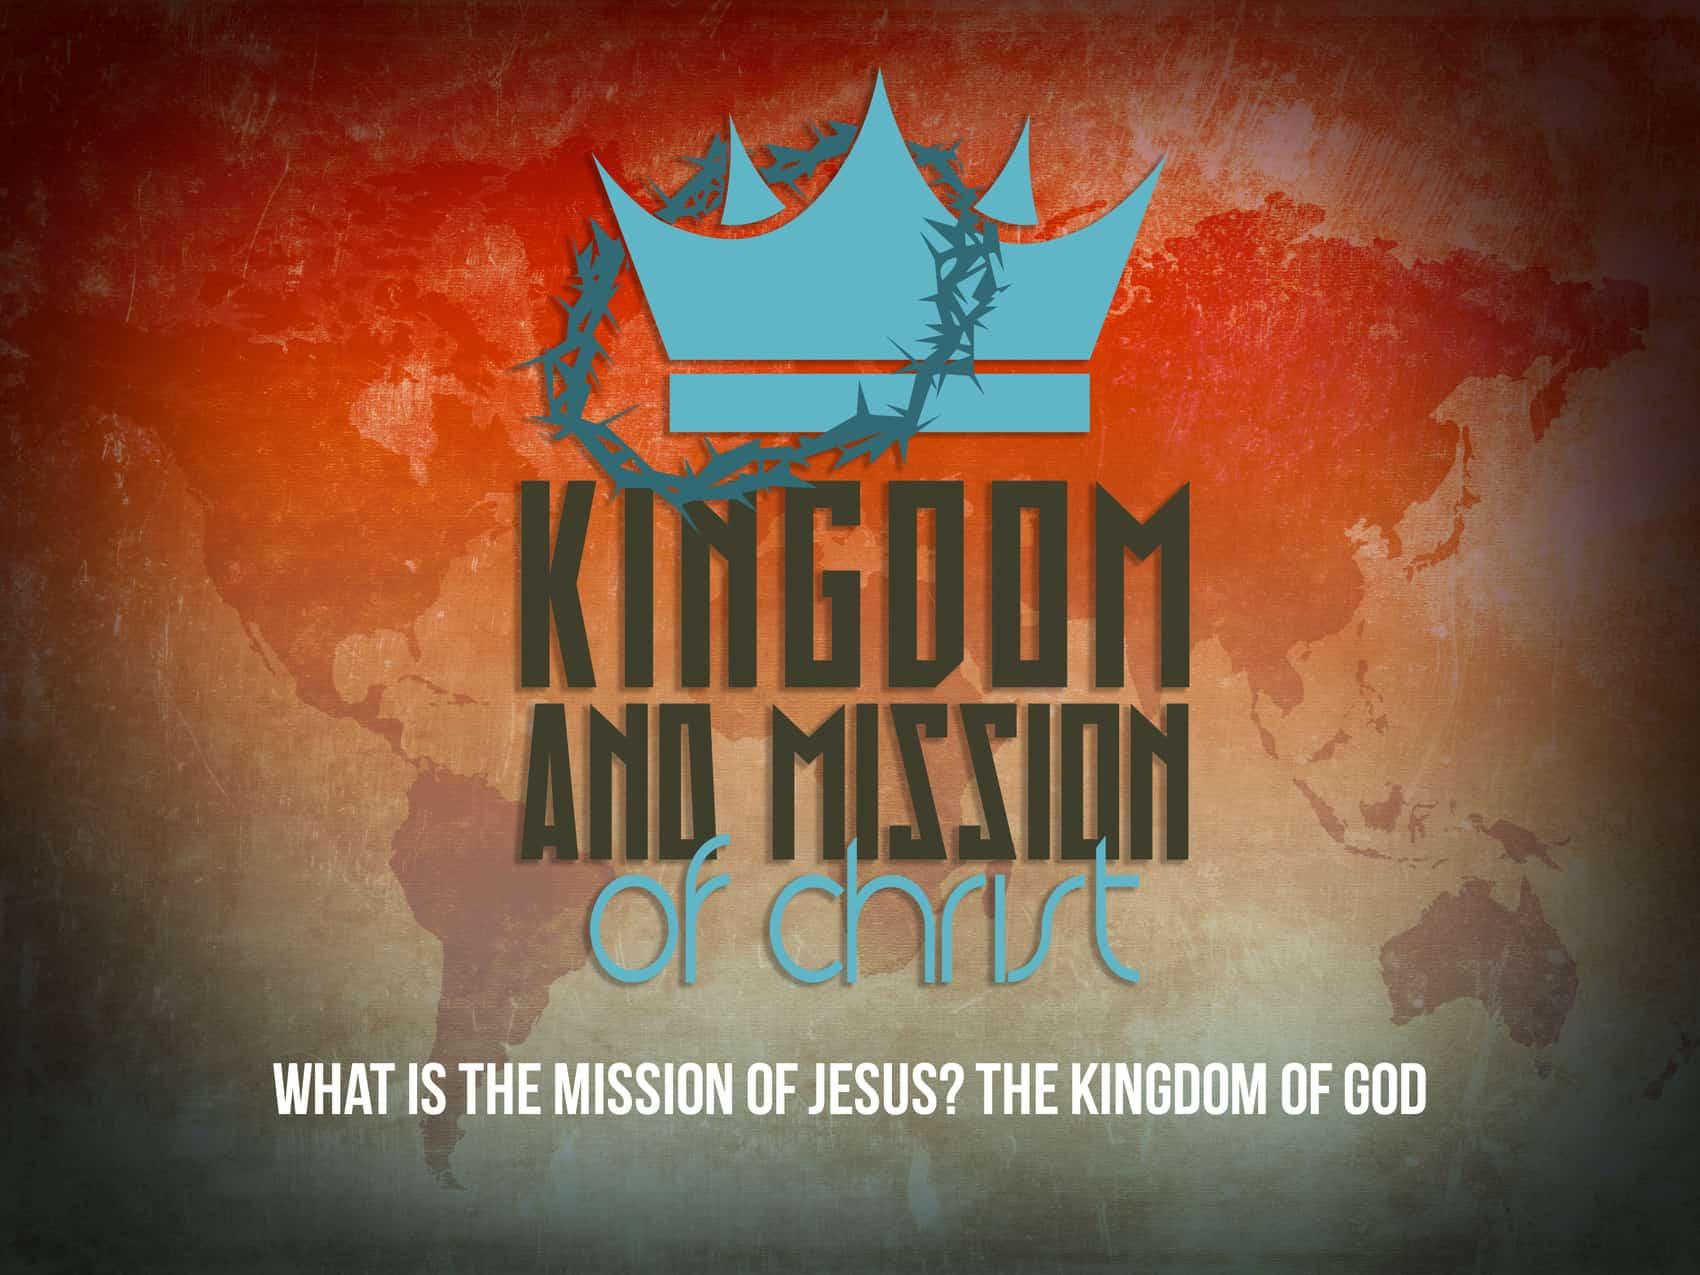 Kingdom and Mission of Christ: The Kingdom of God (9/2/18)